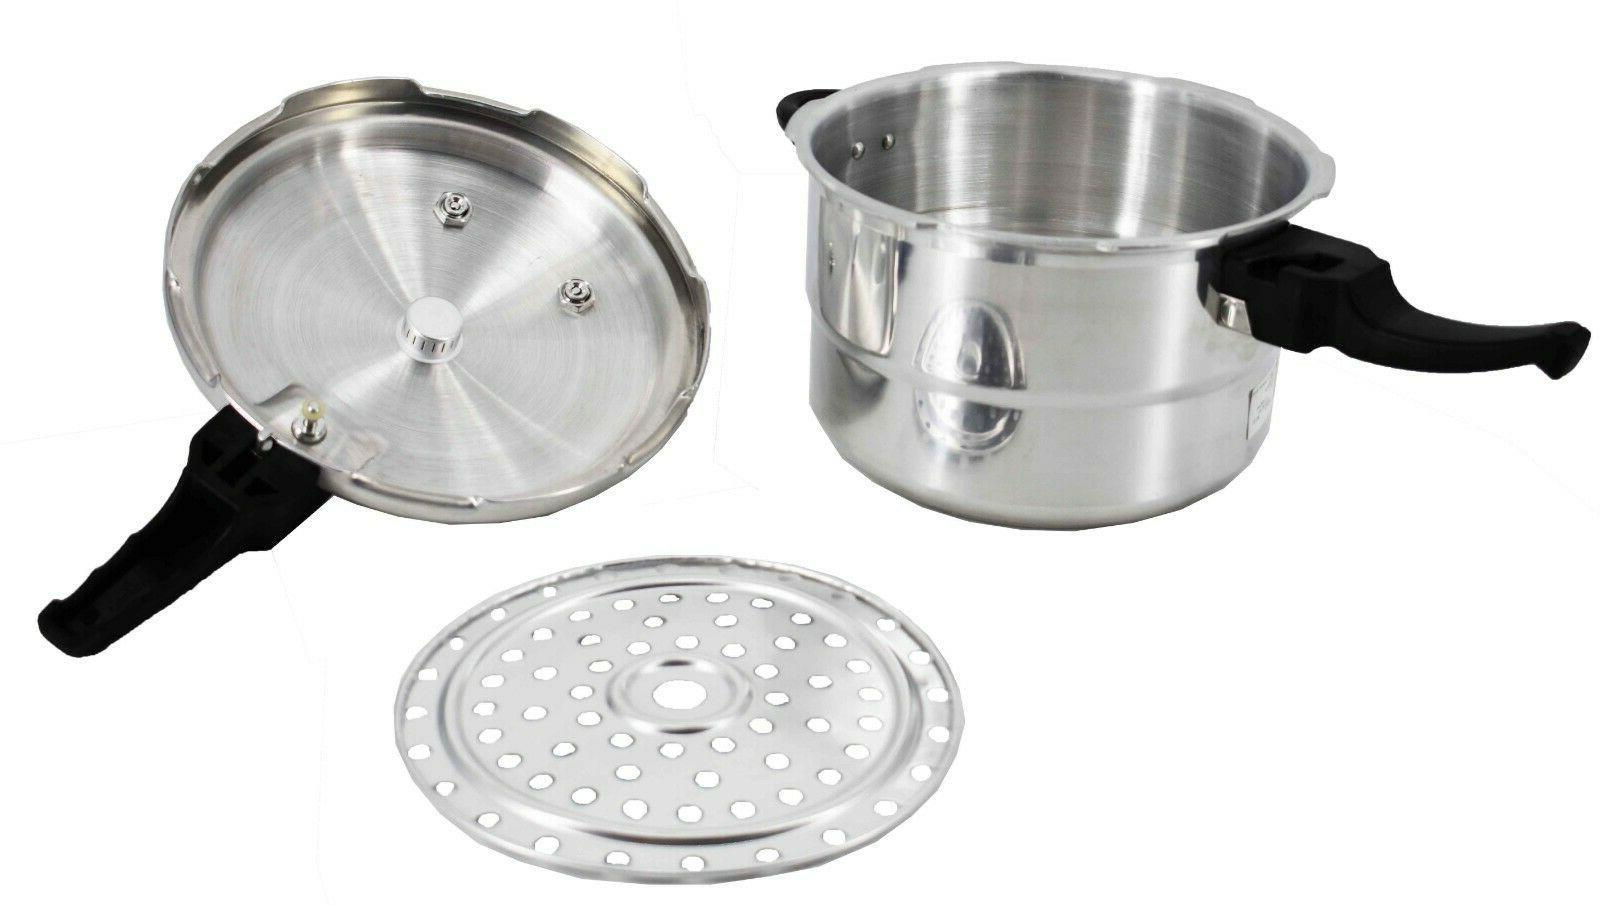 Aluminum Cooker Steamer Cooker,4.2/5.2/7.39/9.5/11.6